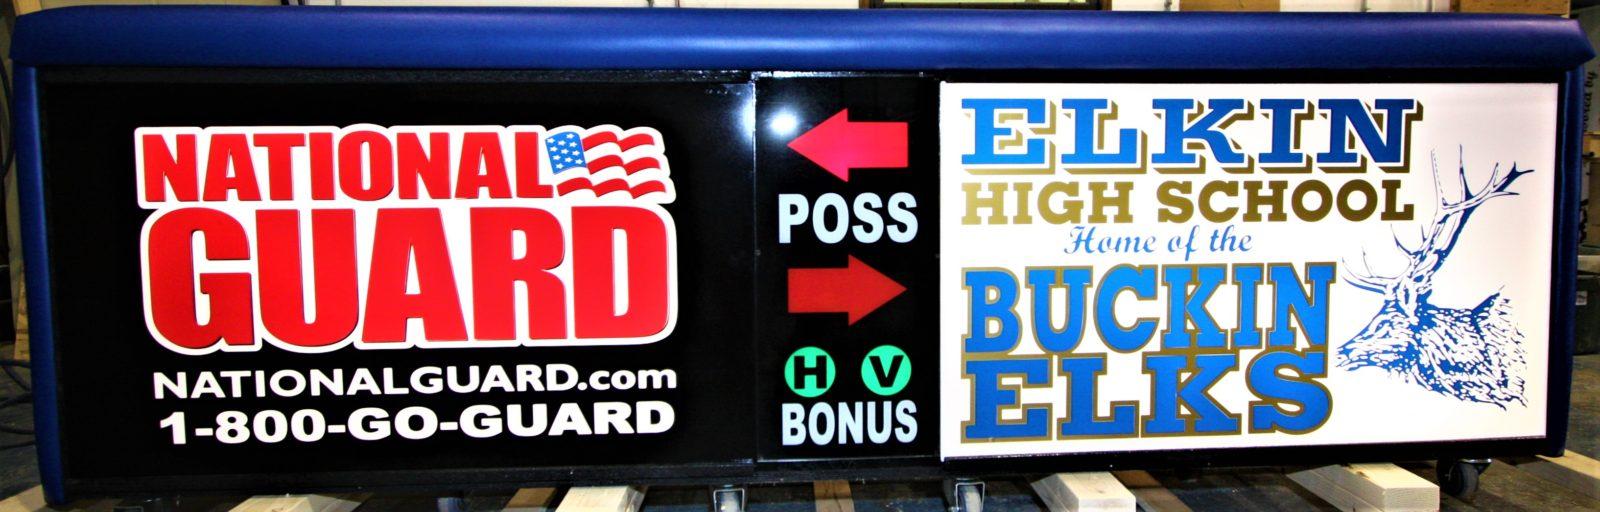 Elkin high school scoring table North Carolina Army National Guard NCARNG